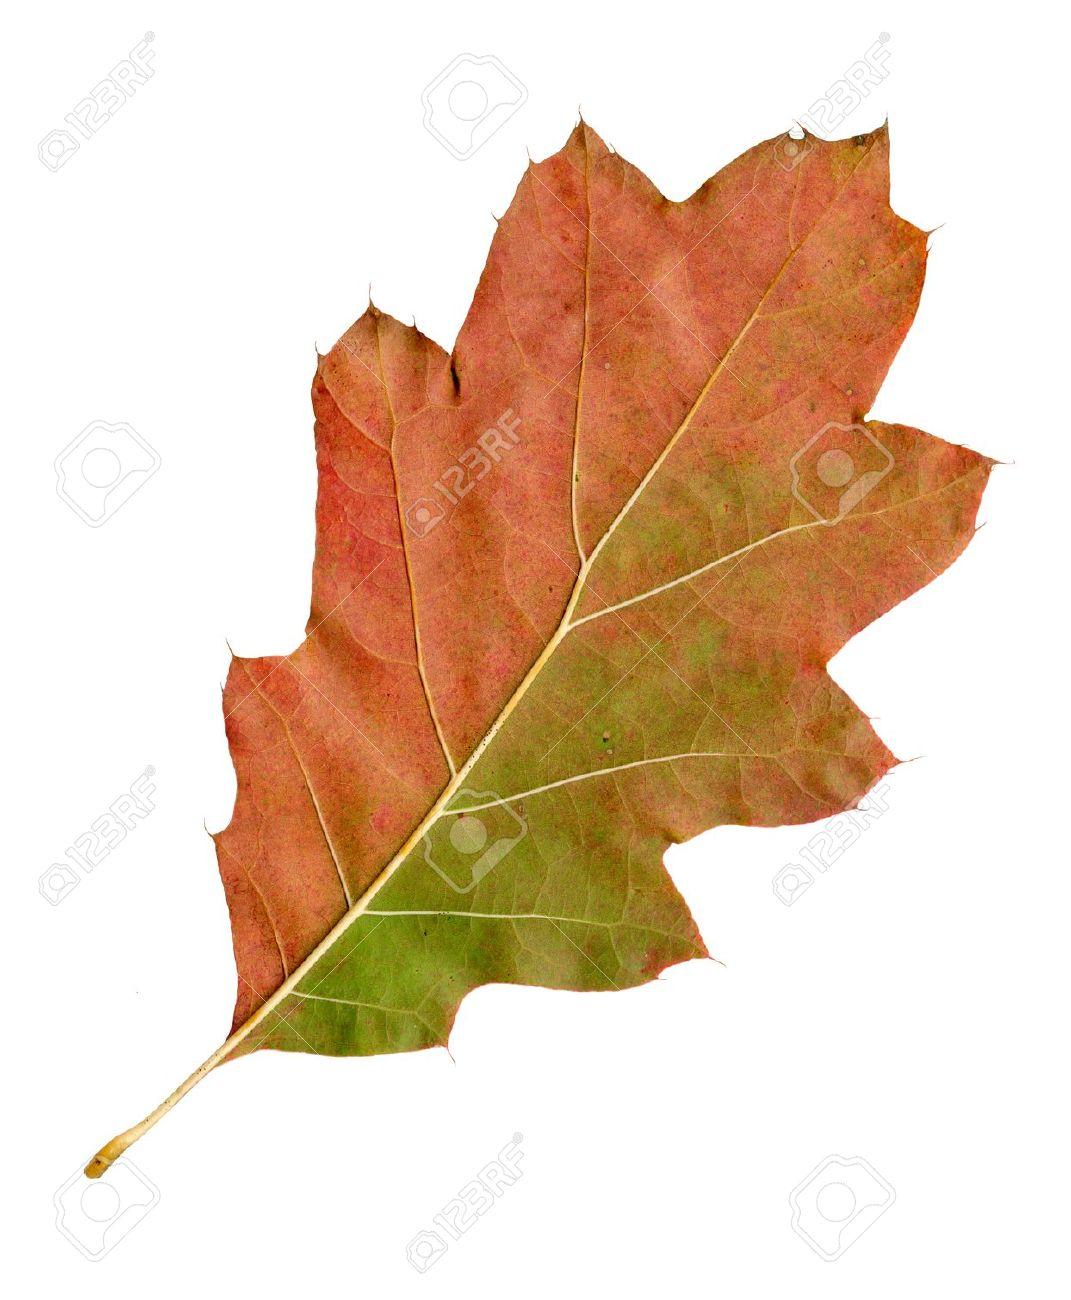 Herbstszenen von Red Oak, Bodenplatte, Quercus rubra Standard-Bild - 9886439